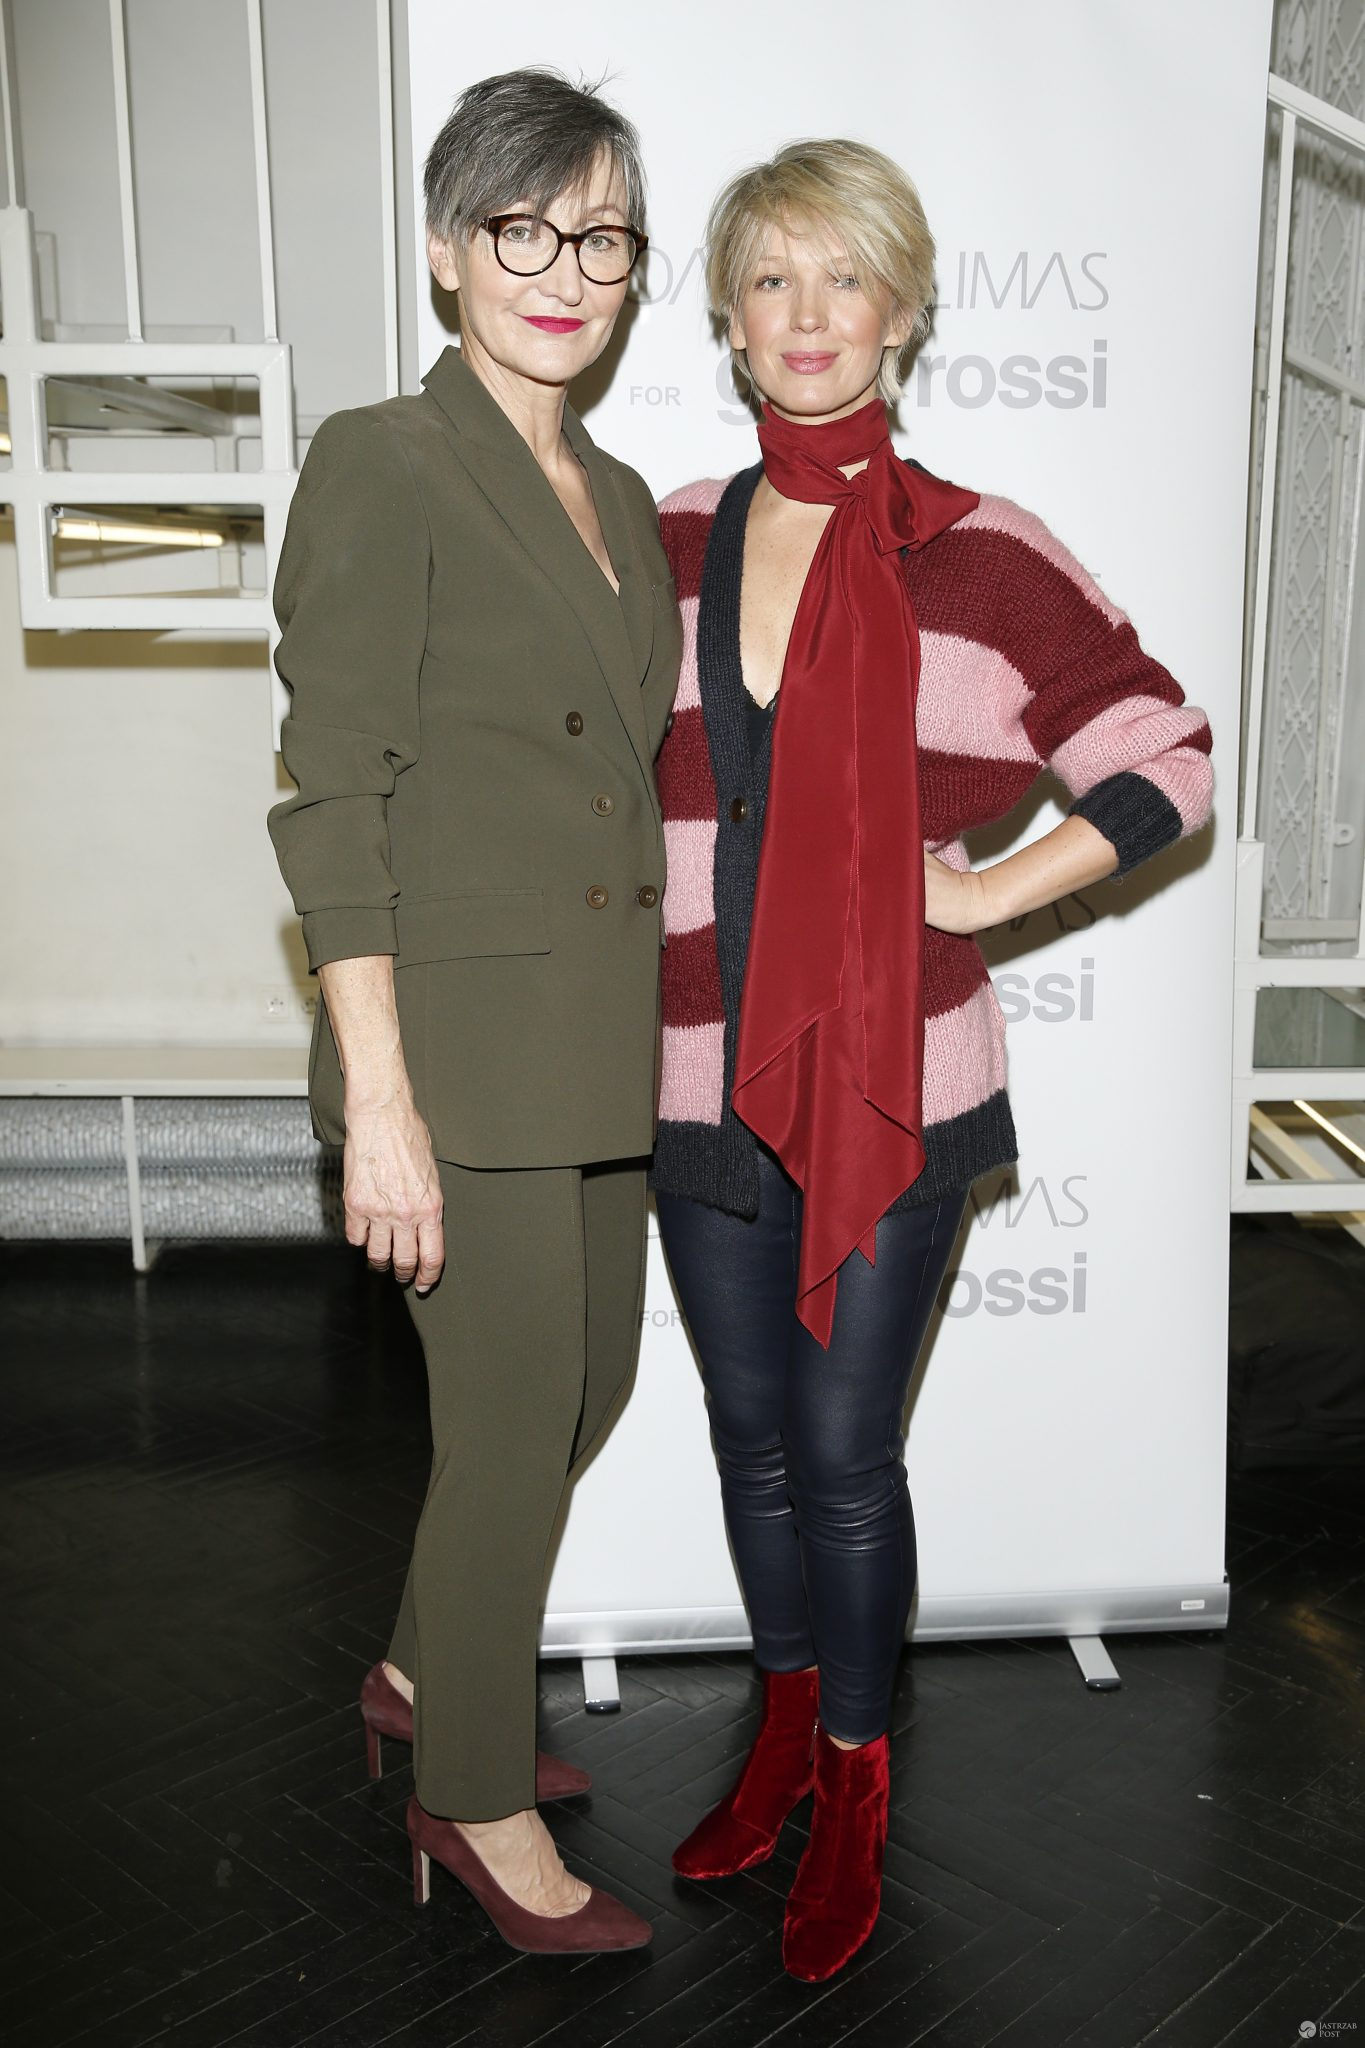 Joanna Klimas i Magda Mołek - prezentacja torebek Joanny Klimas